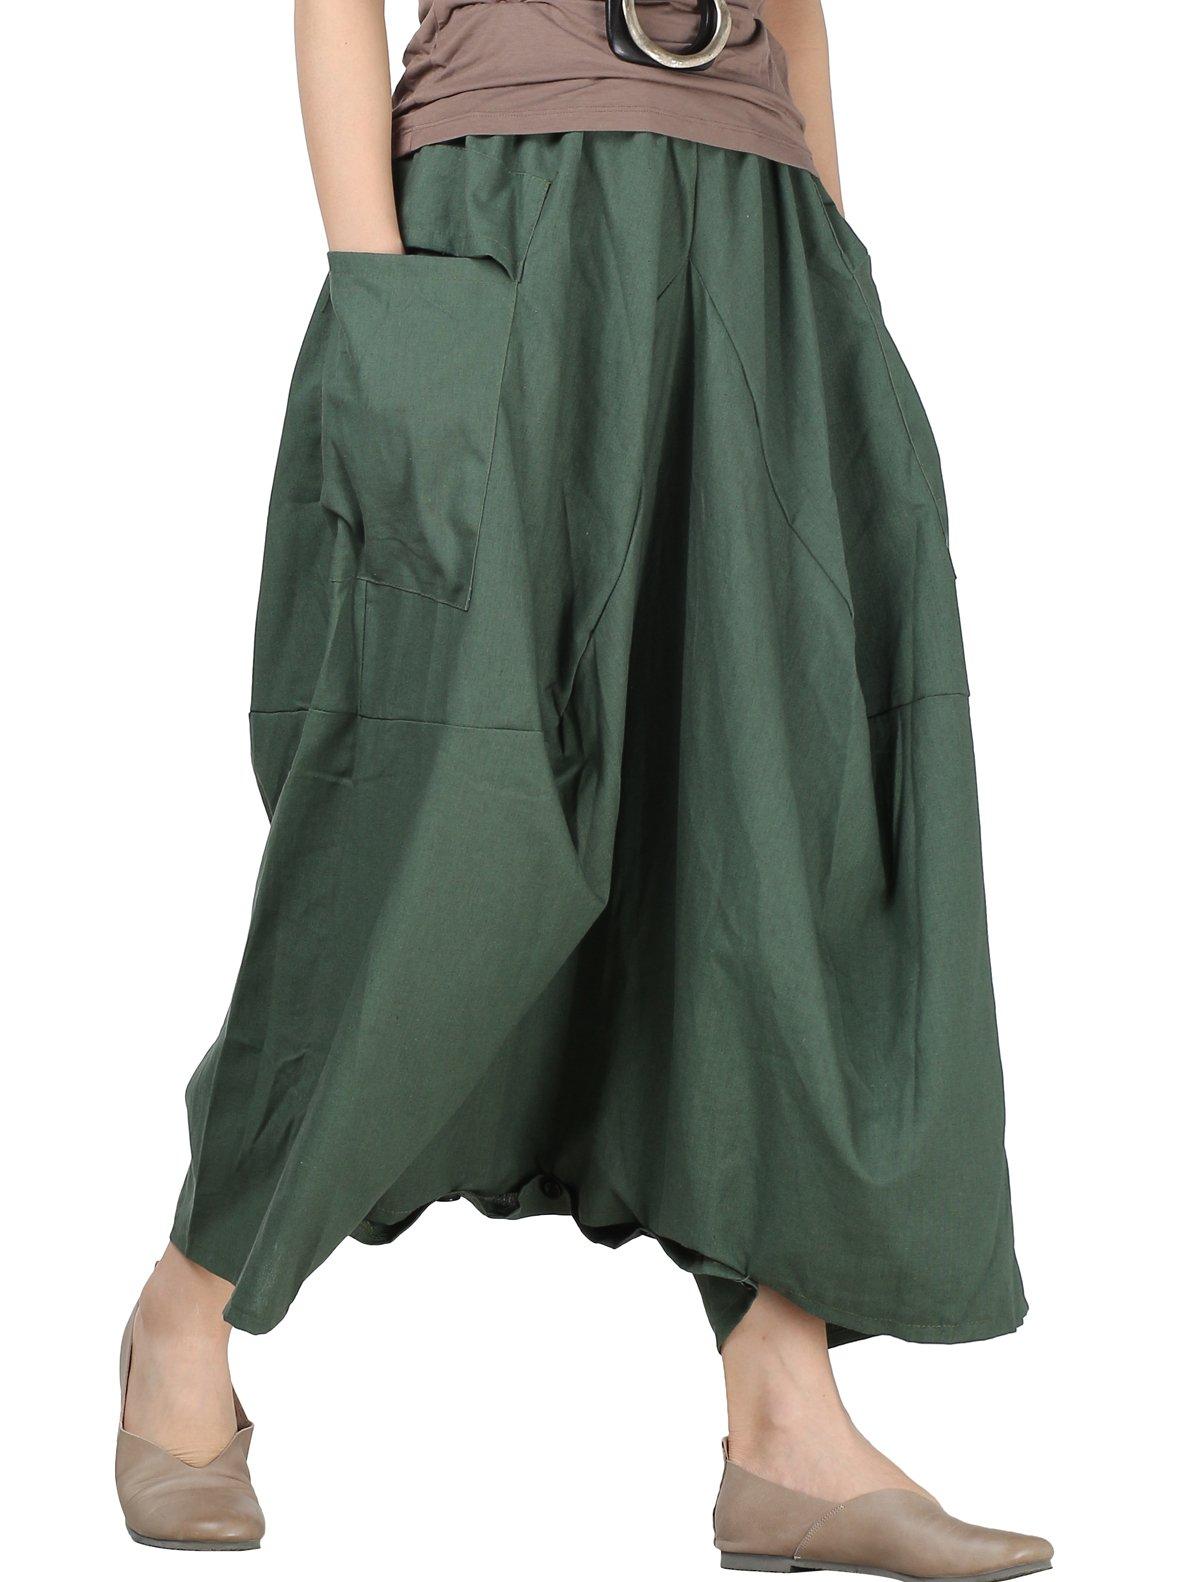 Mordenmiss Women's Drop Crotch Pants Linen Harem Drape Capri Culottes Style 3 Green